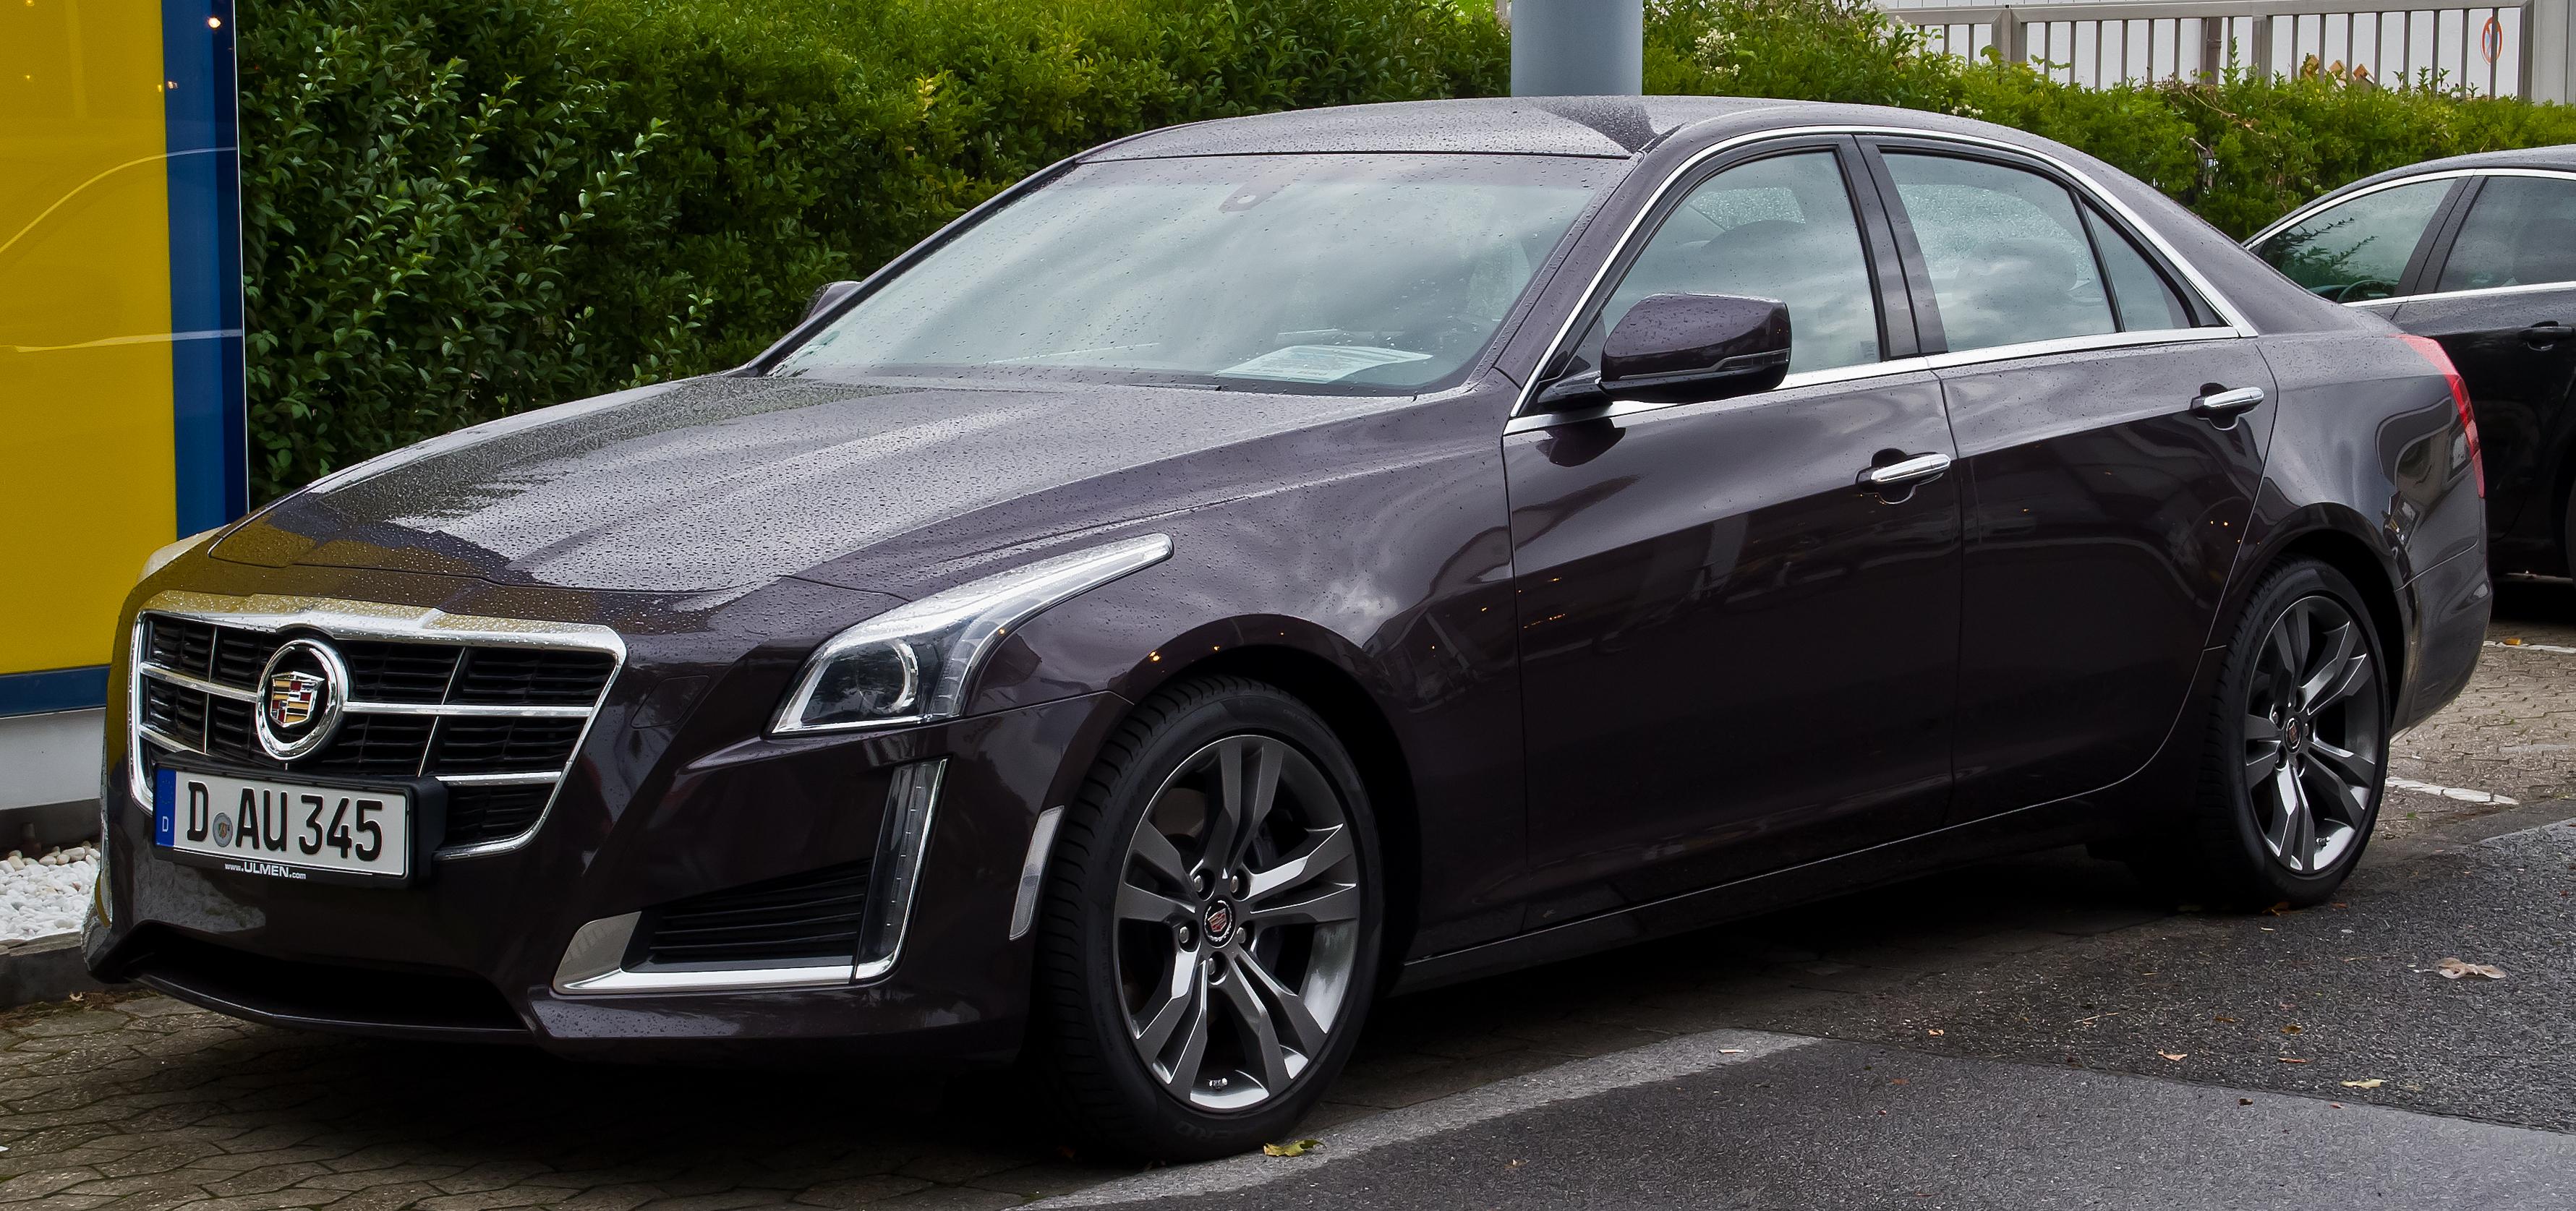 2014 Cadillac Cts Blacked Out >> Cadillac CTS - Wikiwand